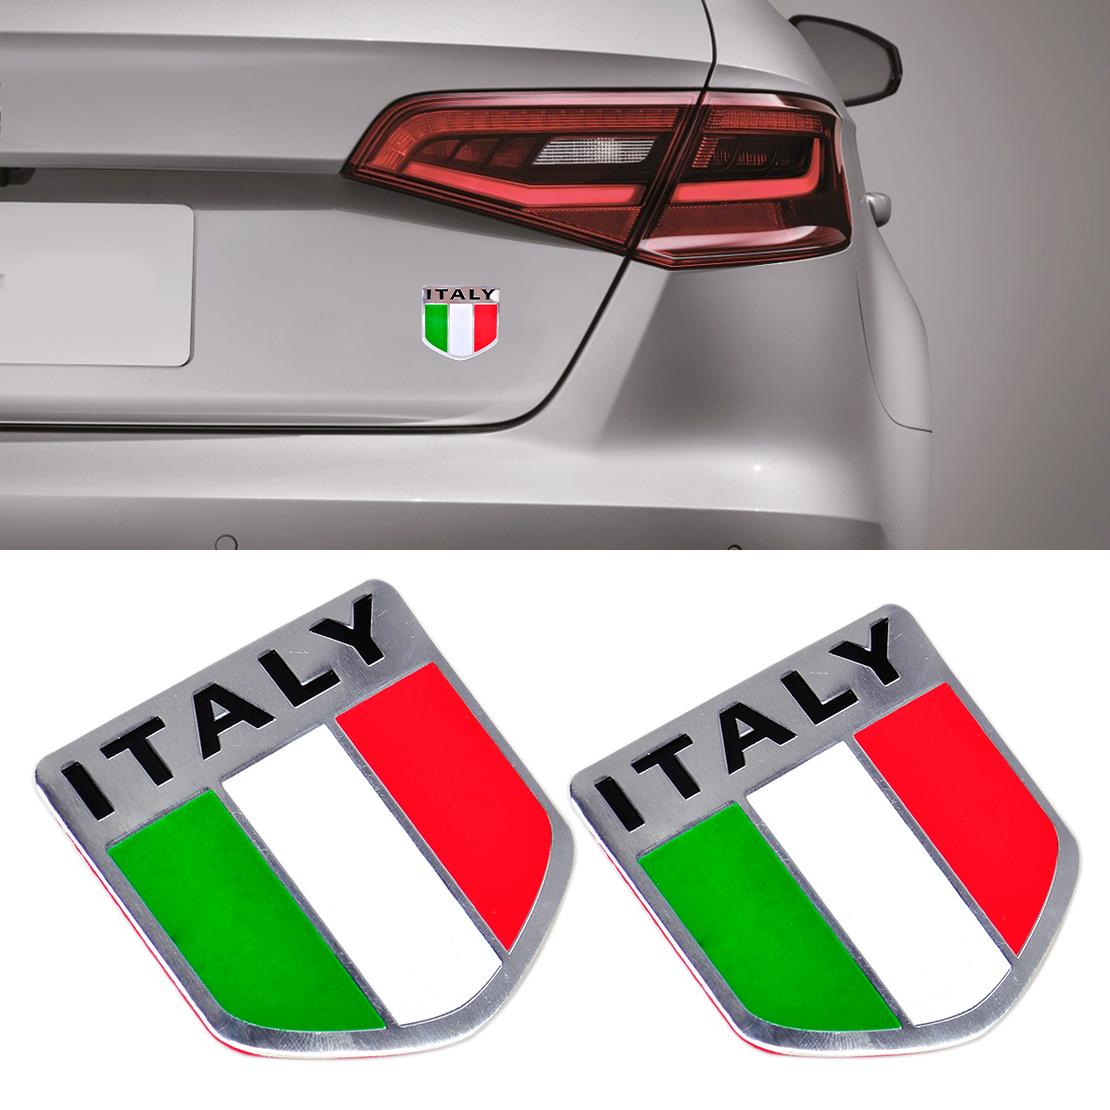 Italian Flag: 2 X Aluminum 3D Metal ITALY Italian Flag Sticker Emblem